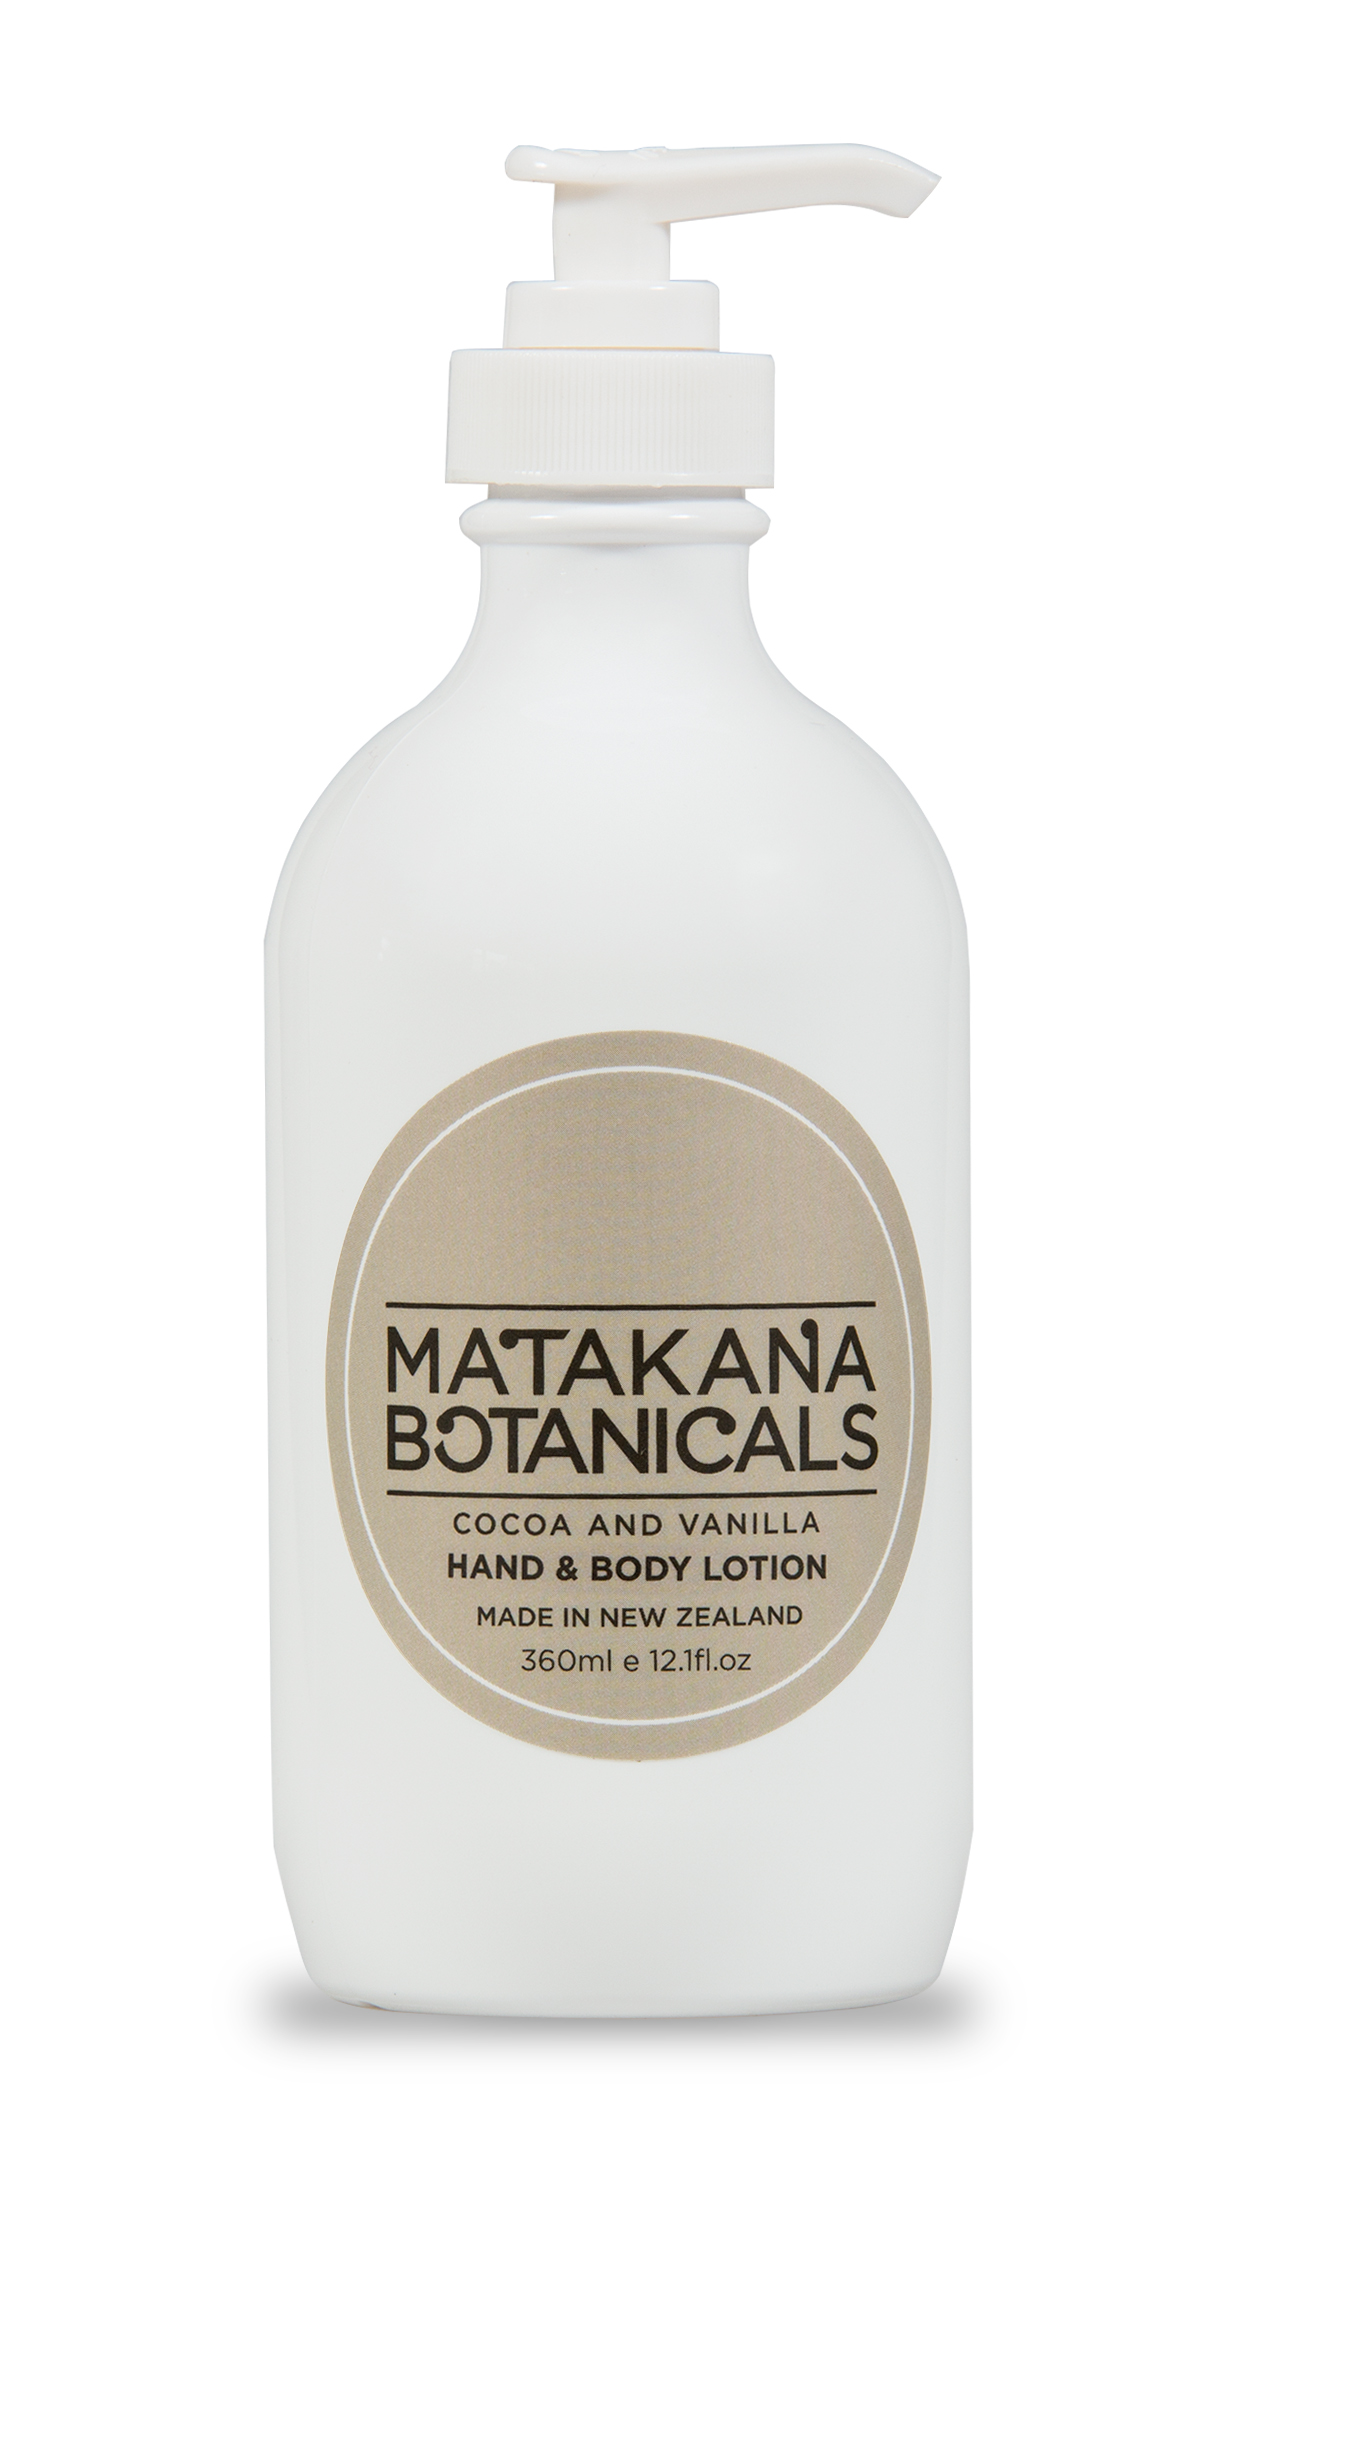 Matakana Botanicals Cocoa & Vanilla Hand & Body Lotion RRP $19